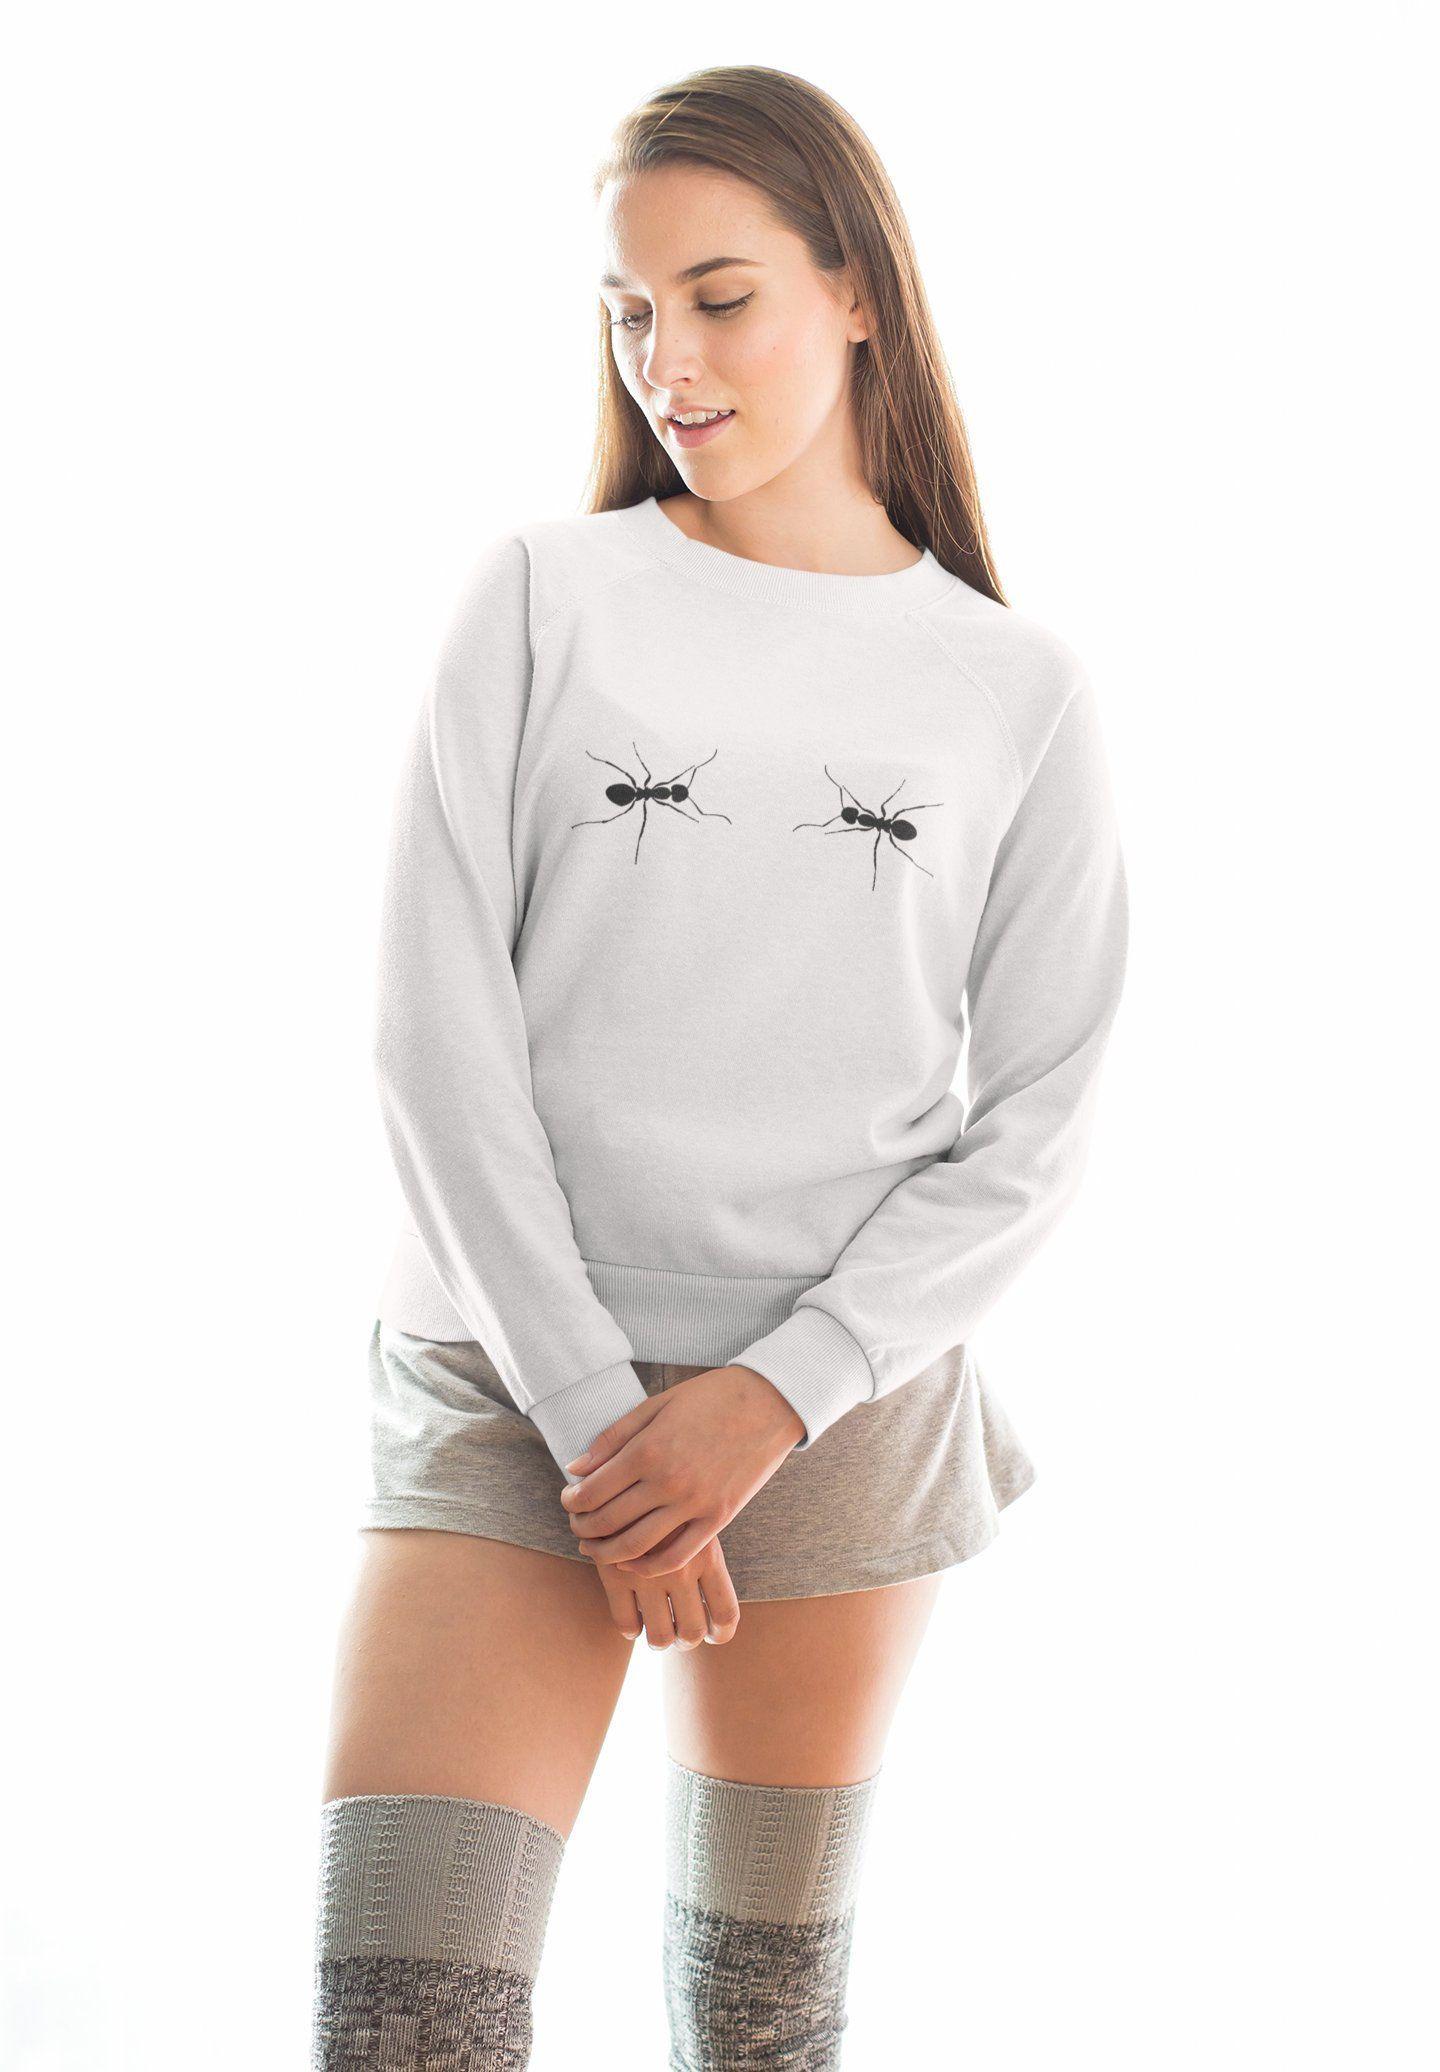 Fashion Clothing Hand Bra Sweater Unique y ts No Bra Top